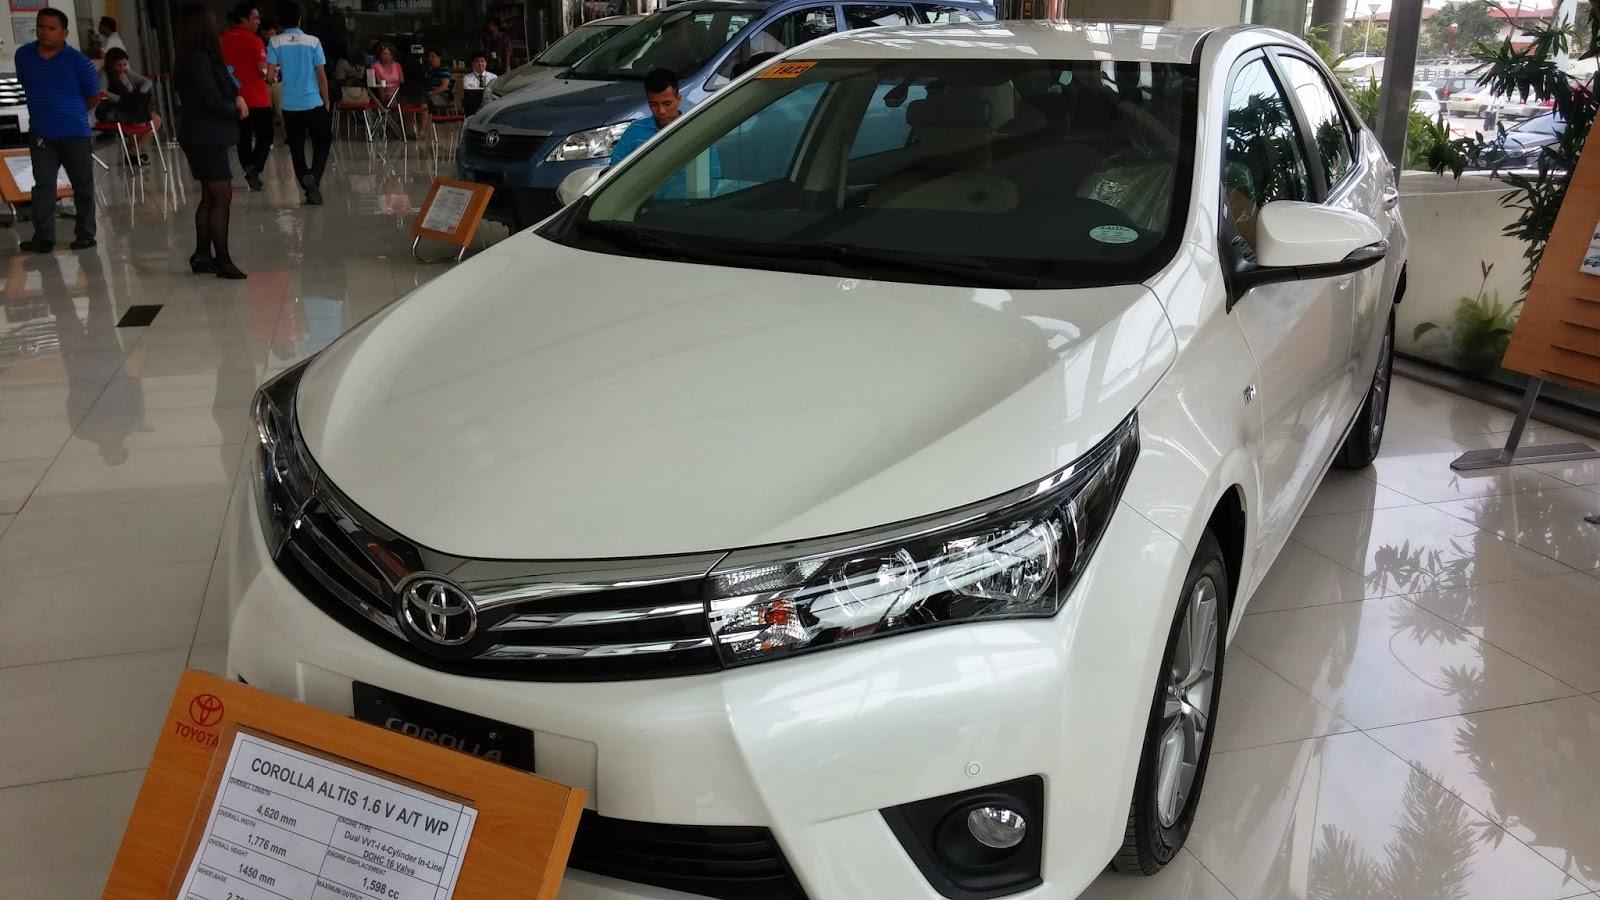 All New Corolla Altis Vs Civic Grand Veloz Semisena Toyota 2014 Lakbay Atbp